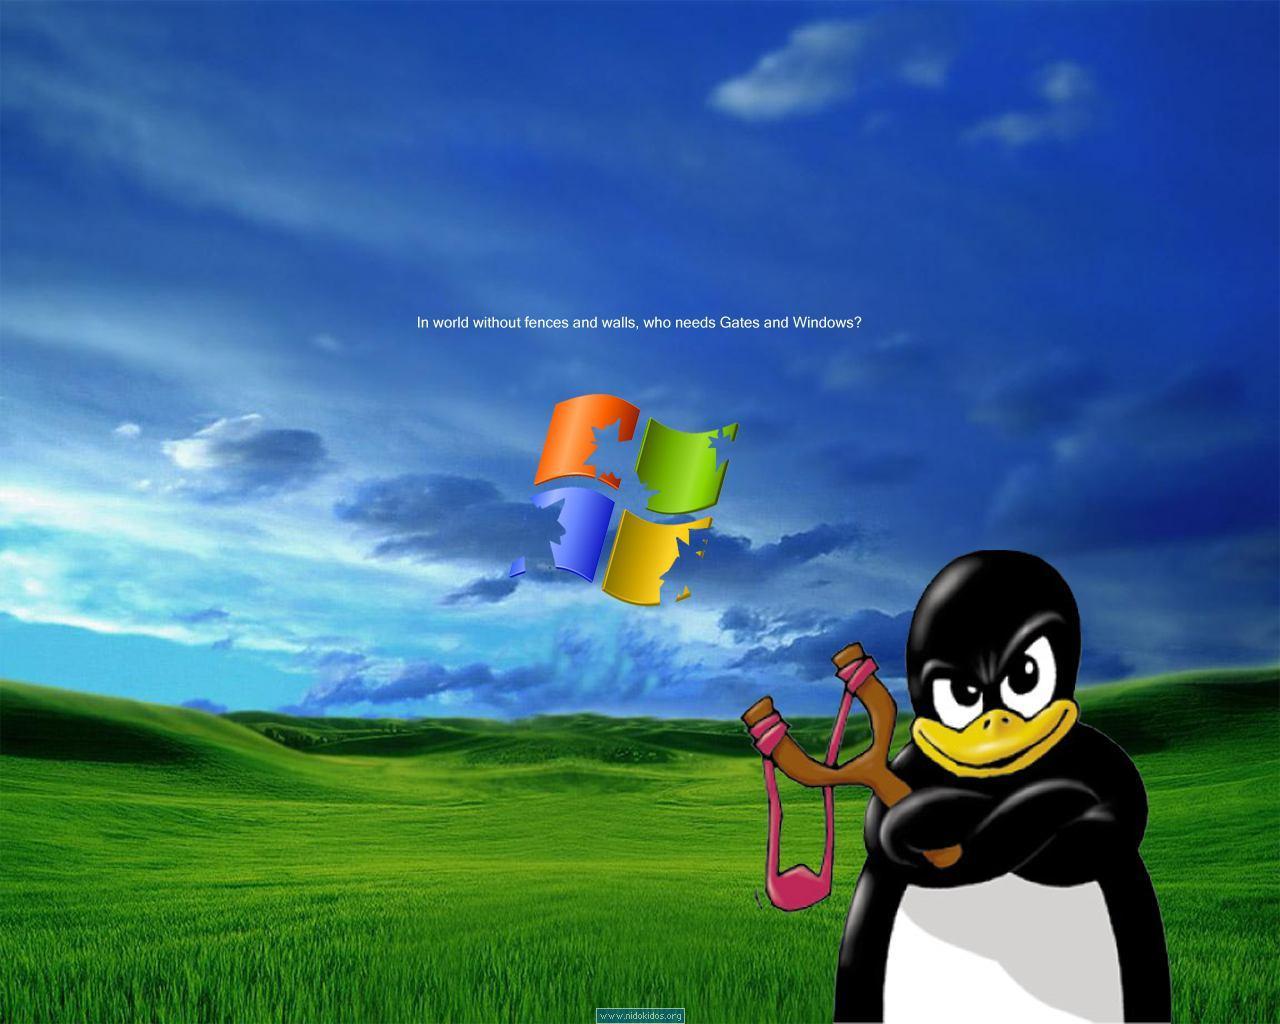 http://3.bp.blogspot.com/_tag0FY3OROU/S-BAx4U5qbI/AAAAAAAACdM/hBWYlHCVNr4/s1600/Linux+wallpaper.JPG